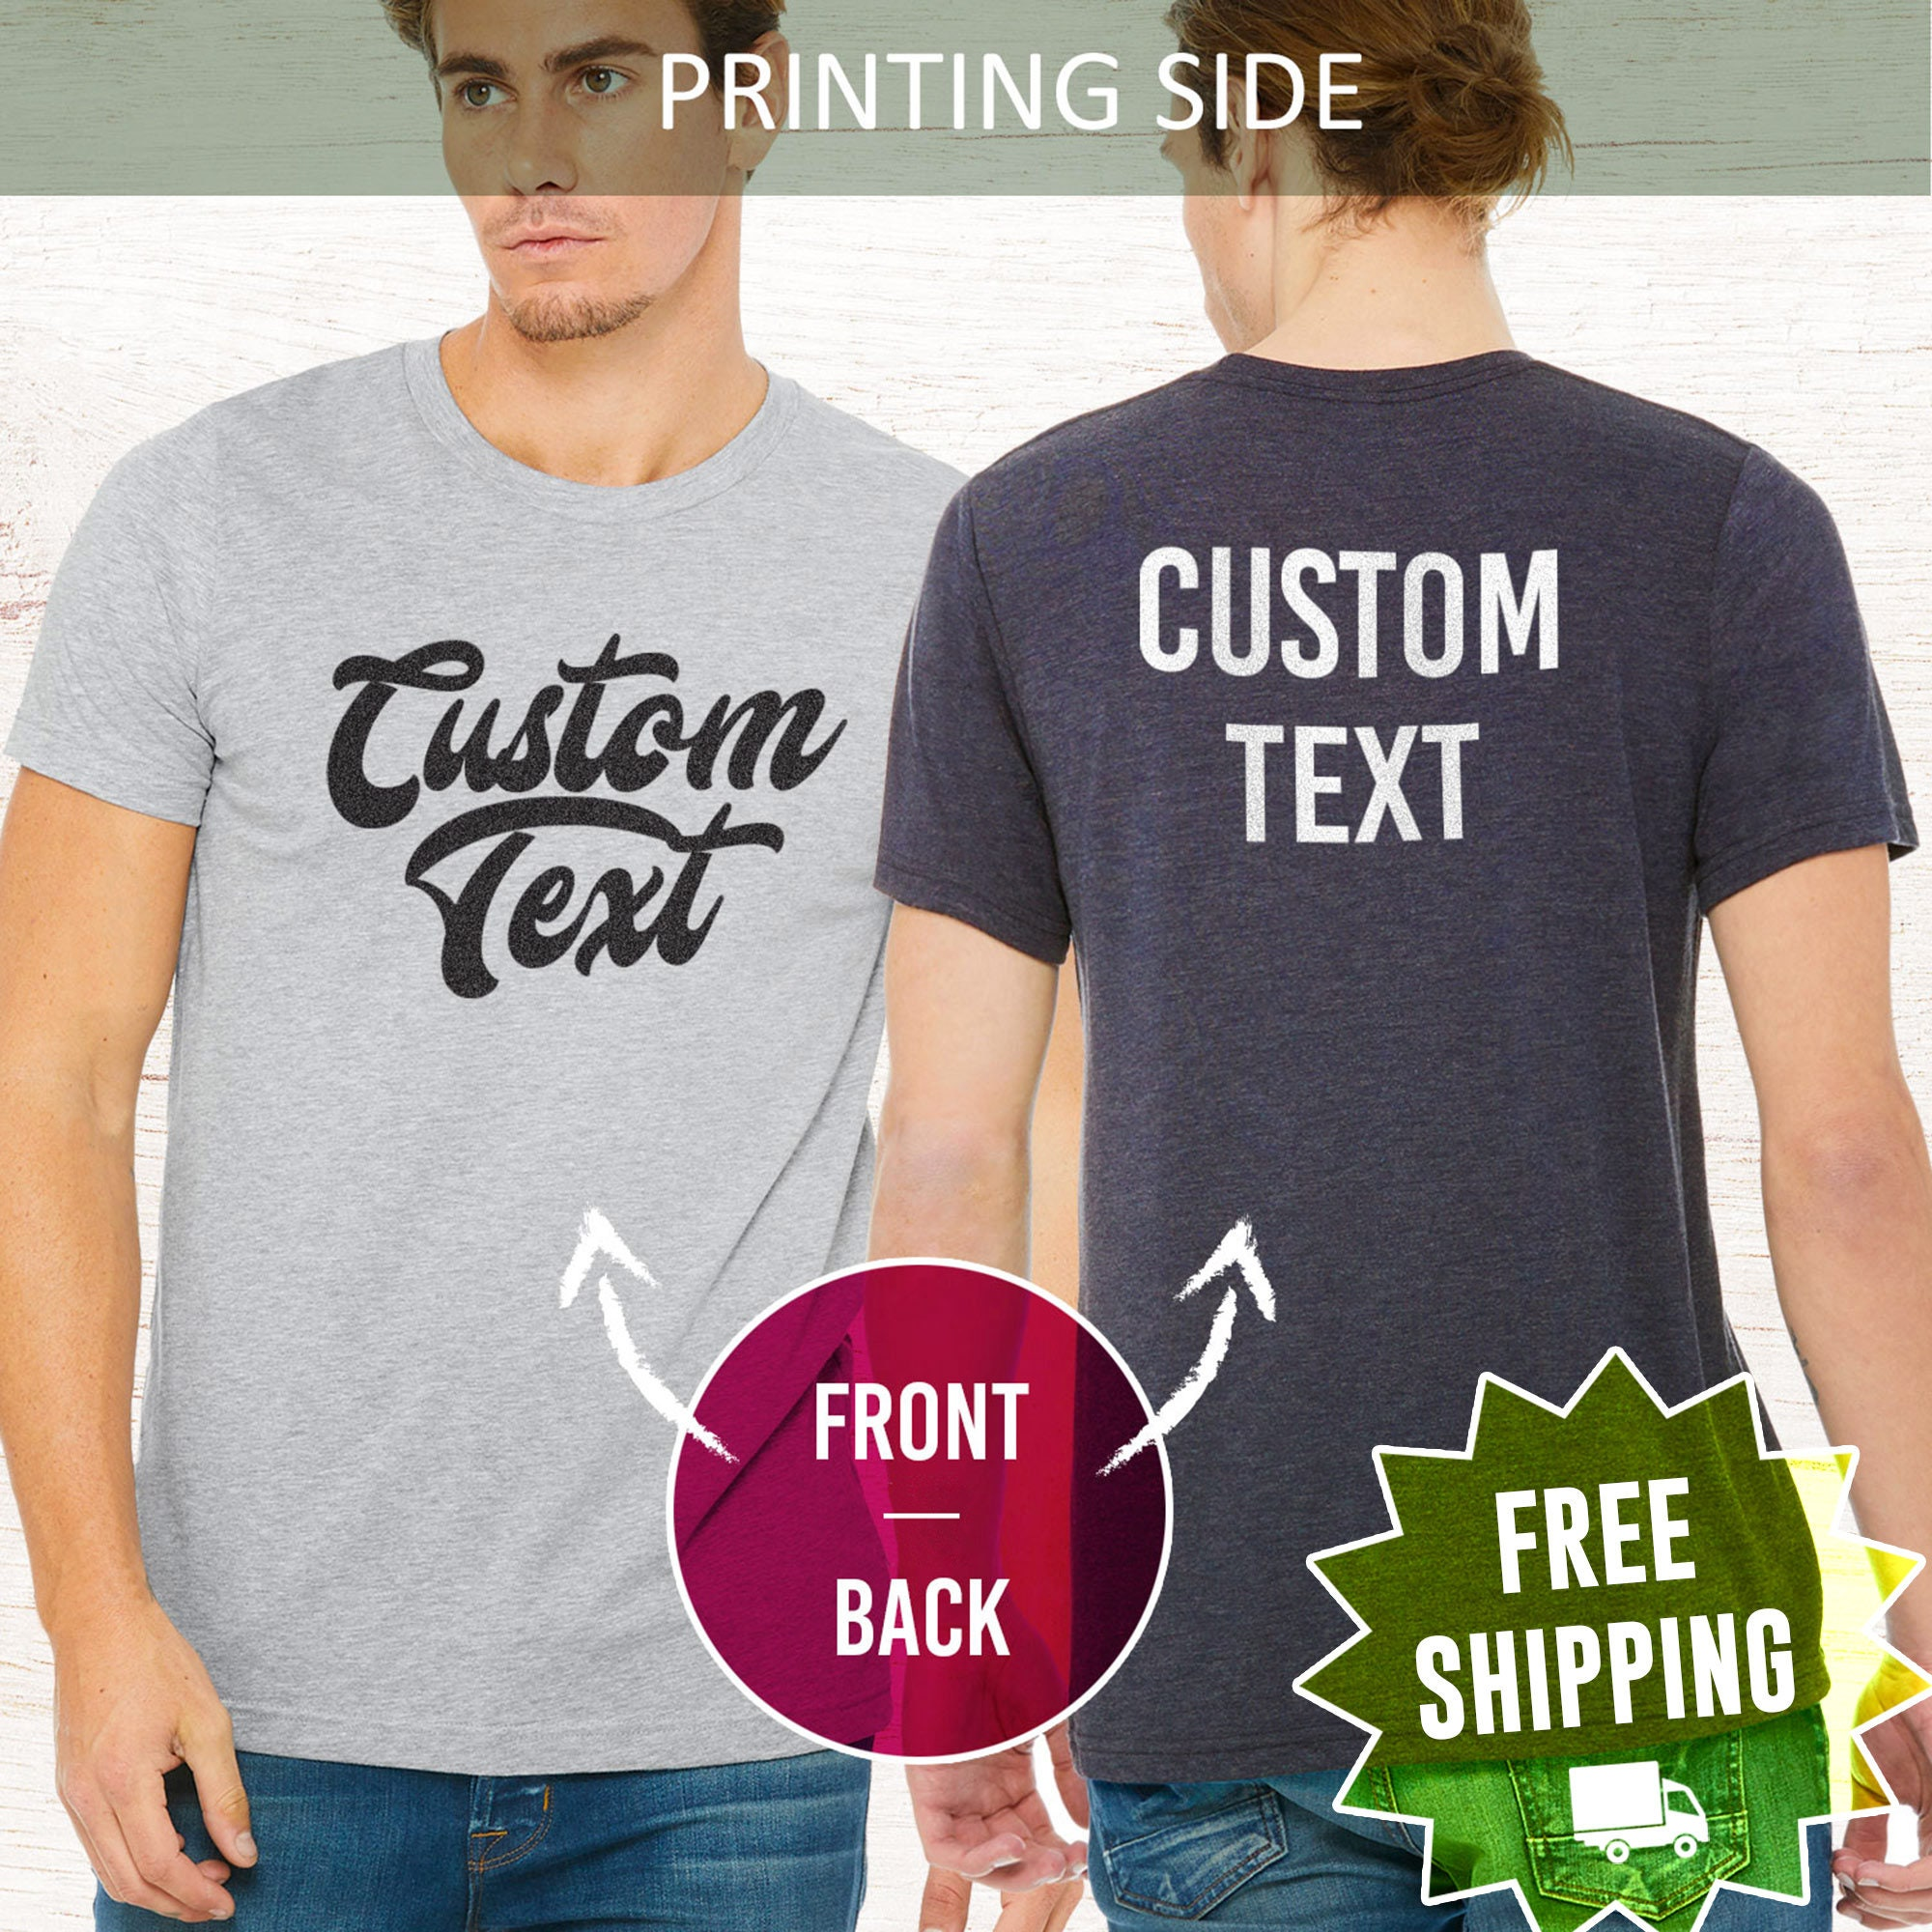 Custom T-shirt Personalized T-shirt Custom Shirt Personalized Shirt Custom Shirt Printing Choose Your Text Men Women Unisex My Text Unisex Tshirt